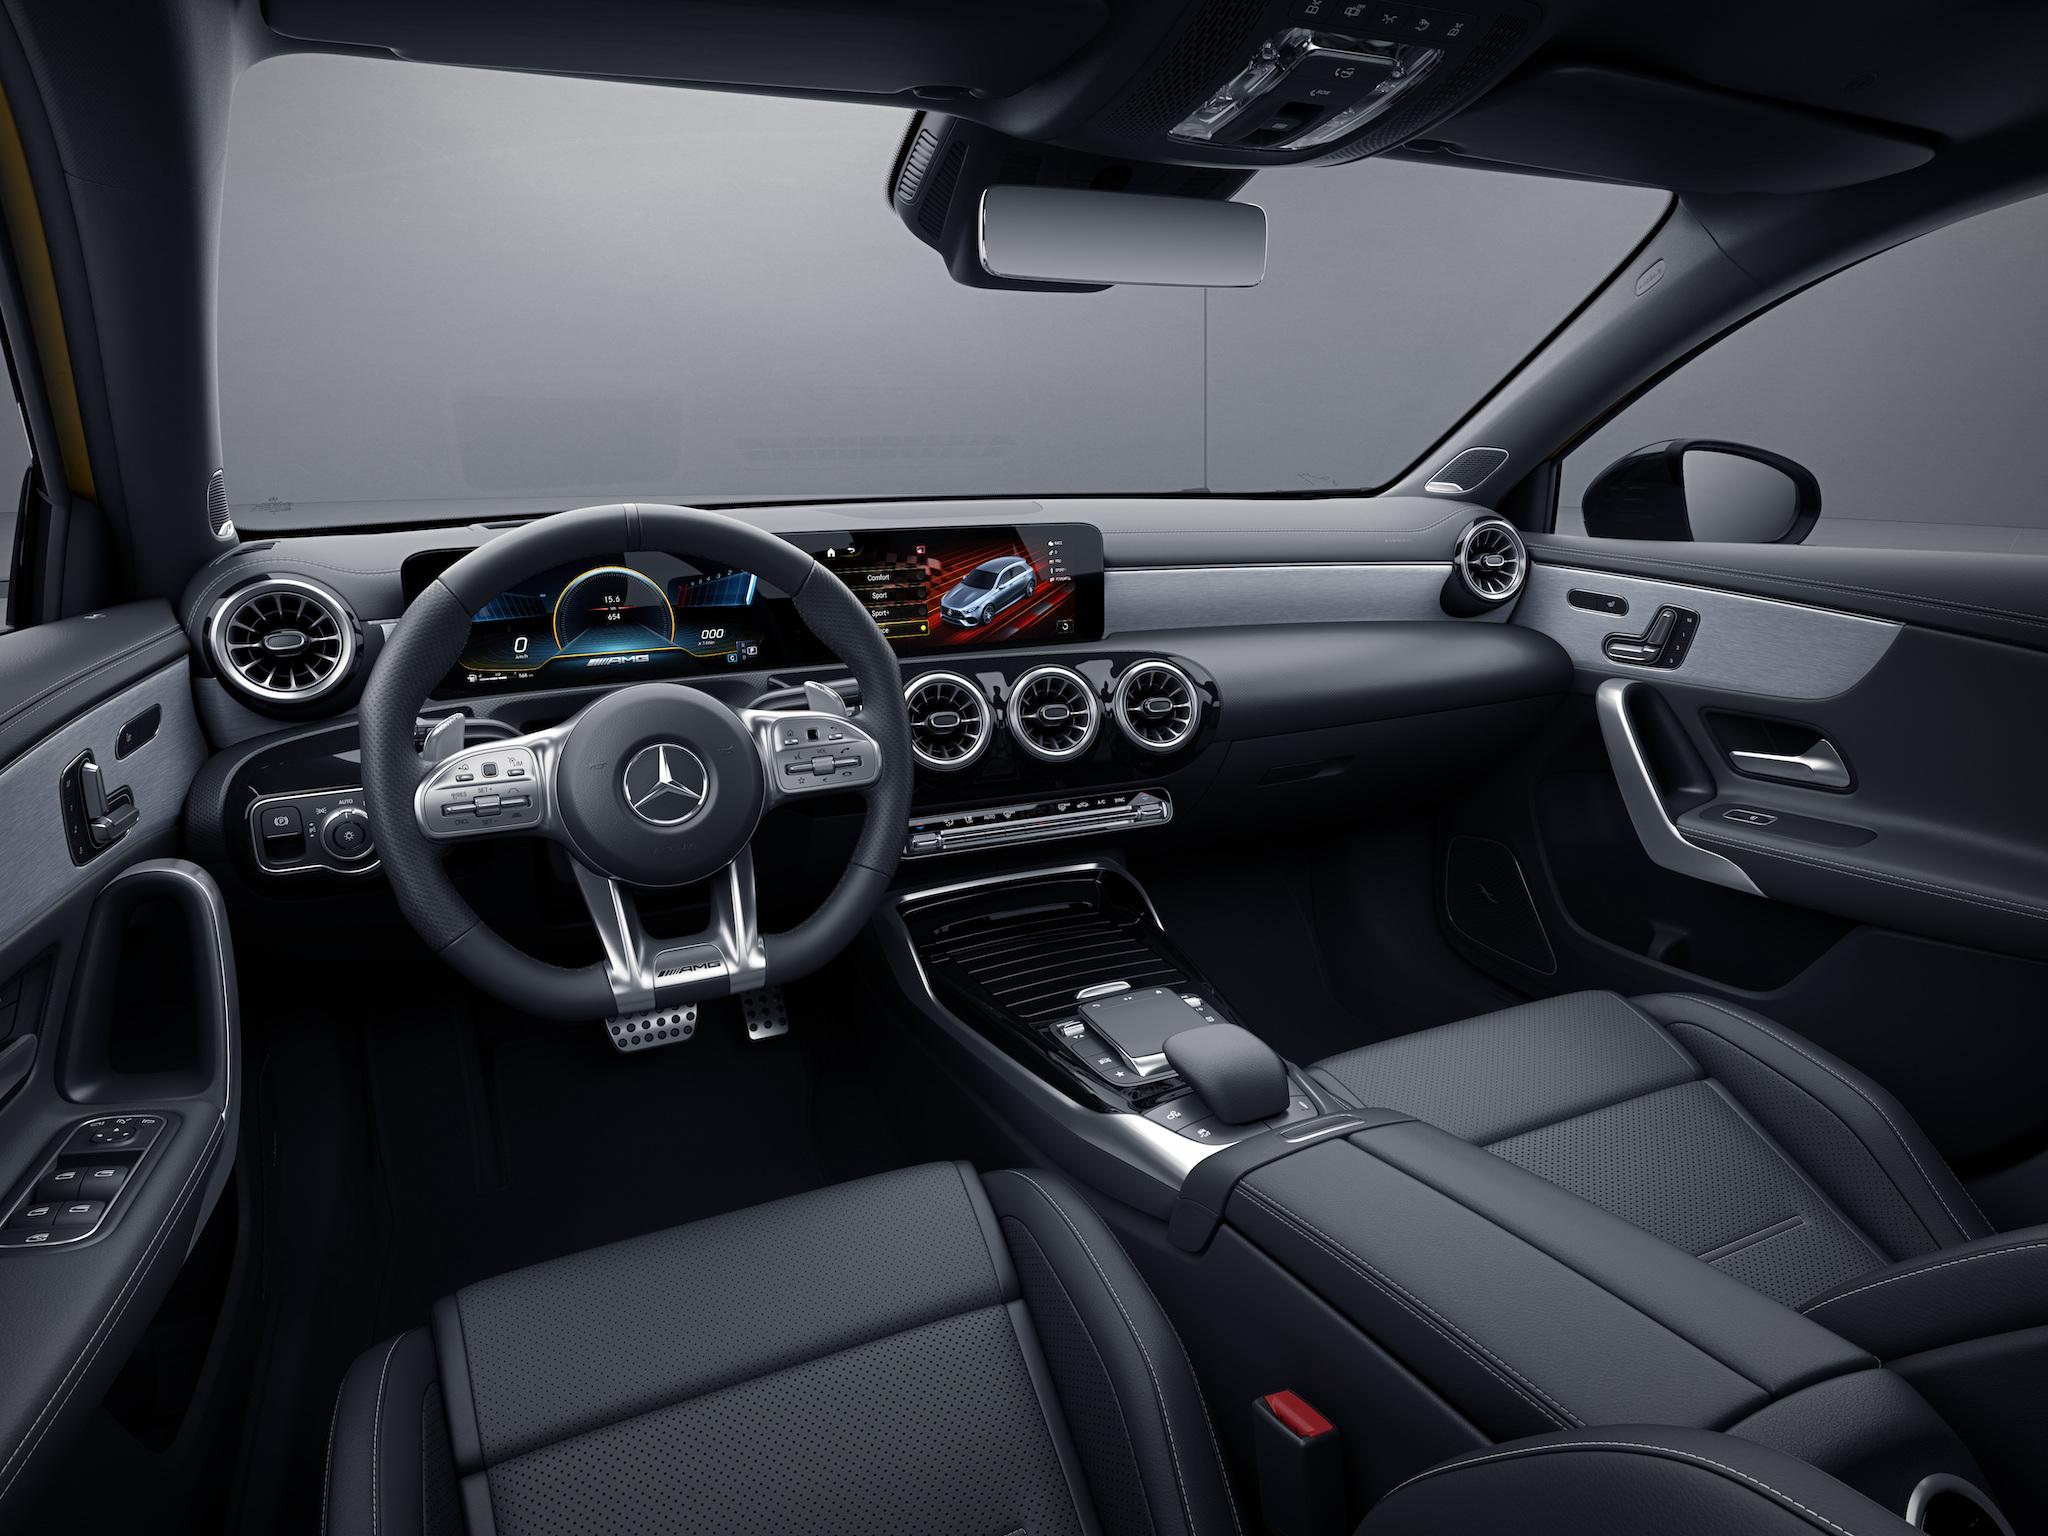 正 21 年式 Mercedes-AMG 35 車系全標配「AMG 高性能 Nappa 真皮平底跑車方向盤」。